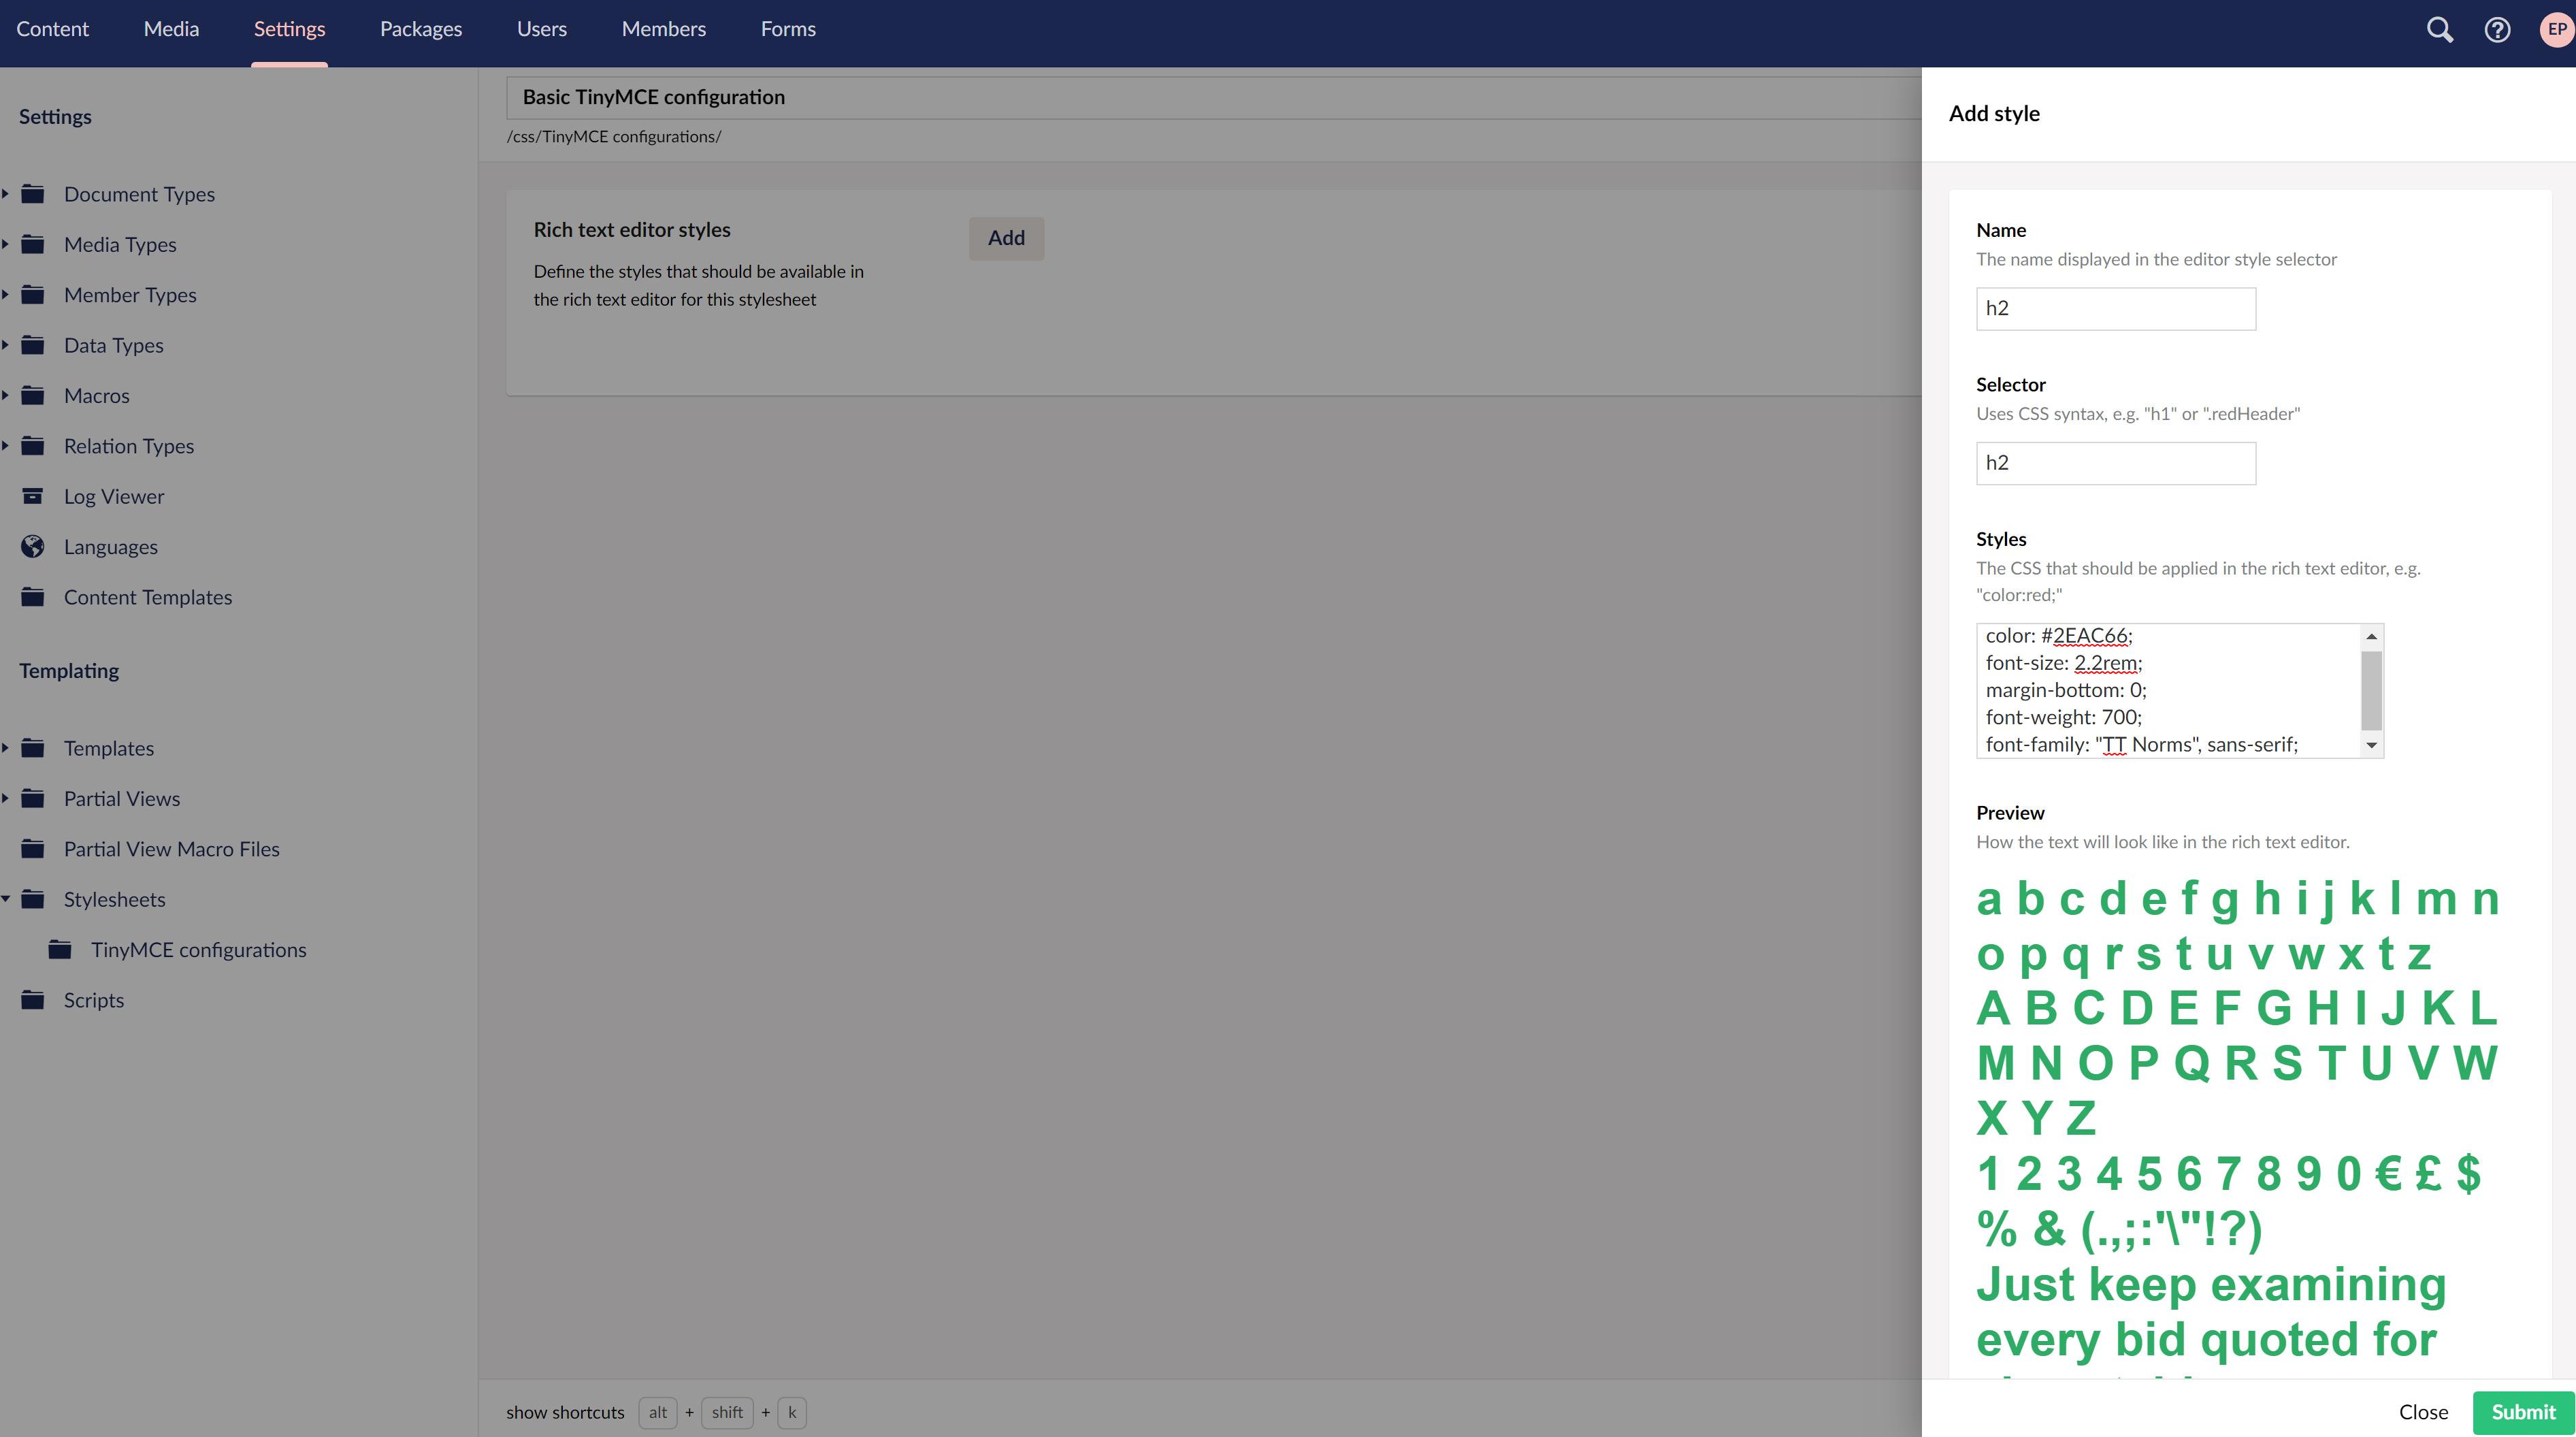 Configure custom TinyMCE settings in Umbraco 8